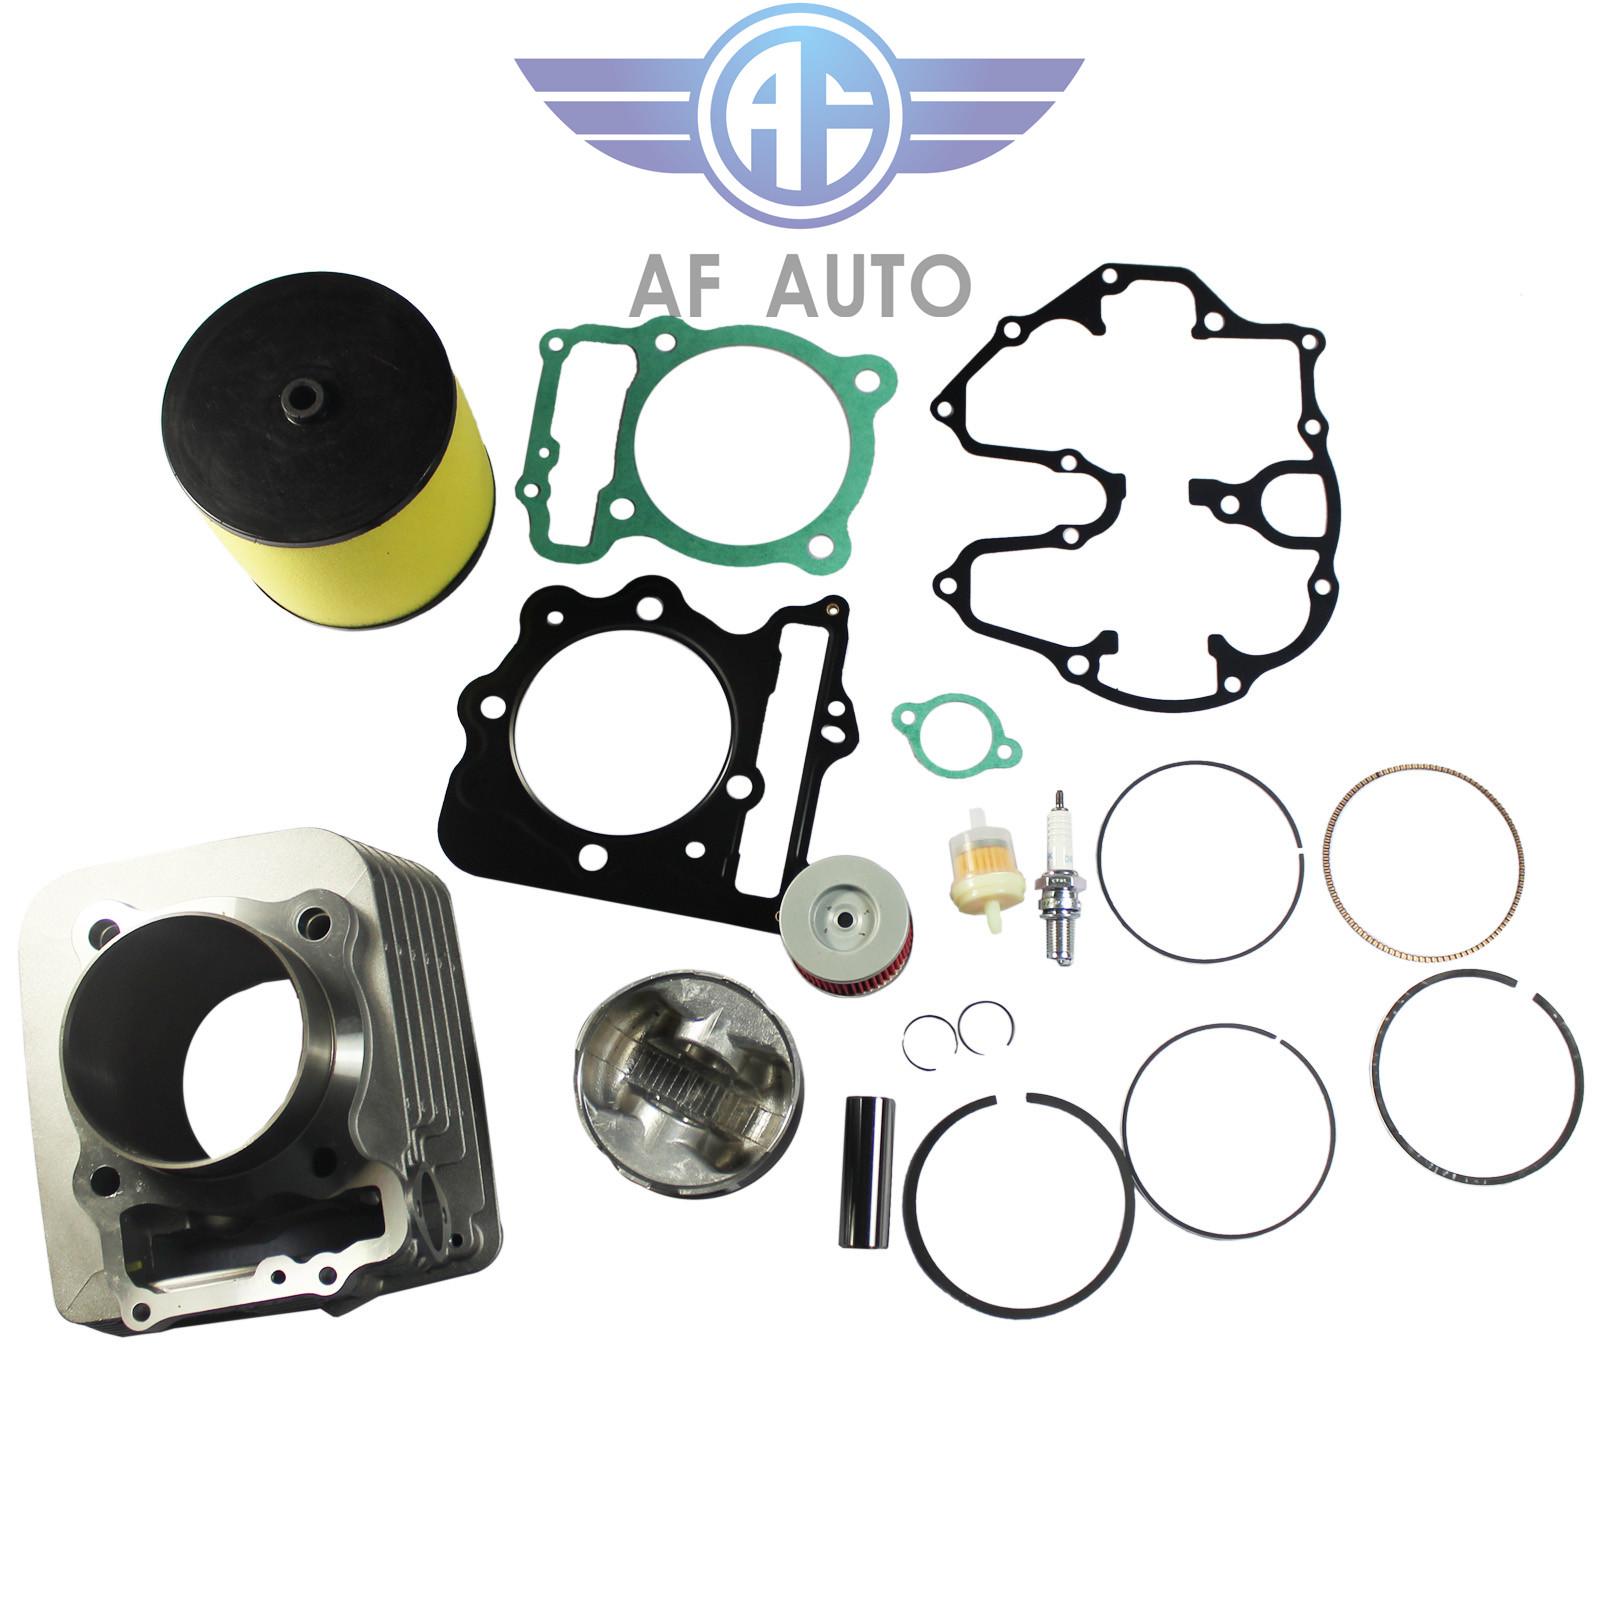 12251-HN1-003 HONDA TRX400EX TRX 400EX ENGINE CYLINDER HEAD GASKET OEM